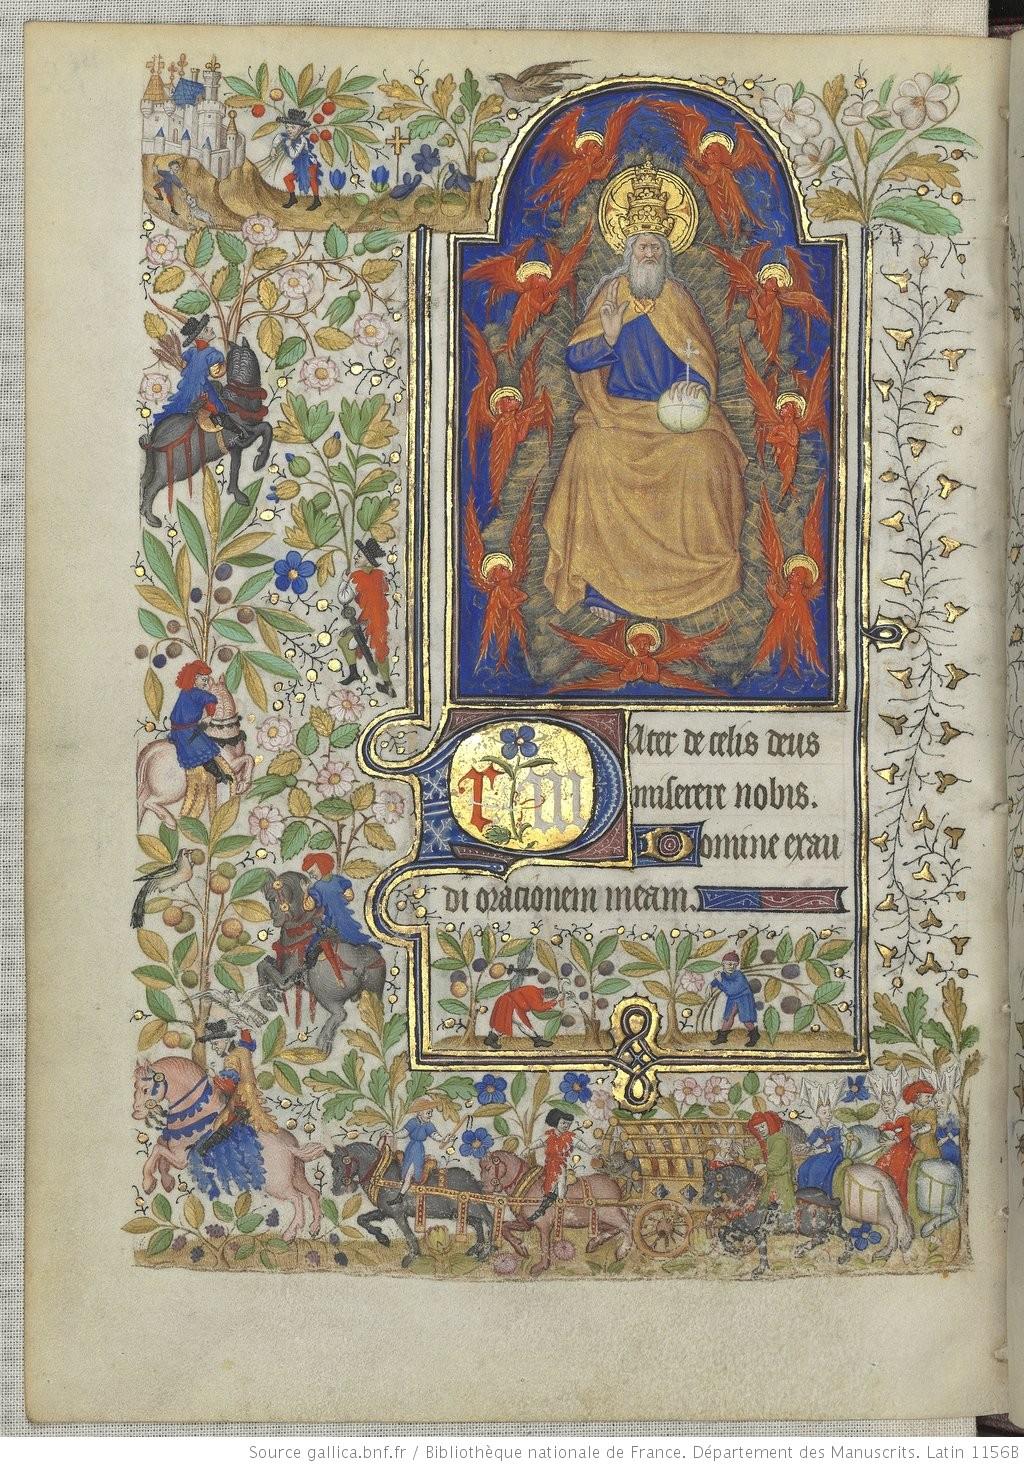 Heures de Marguerite d'Orleans 1430 ca BNF Latin 1156B fol 158v Gallica